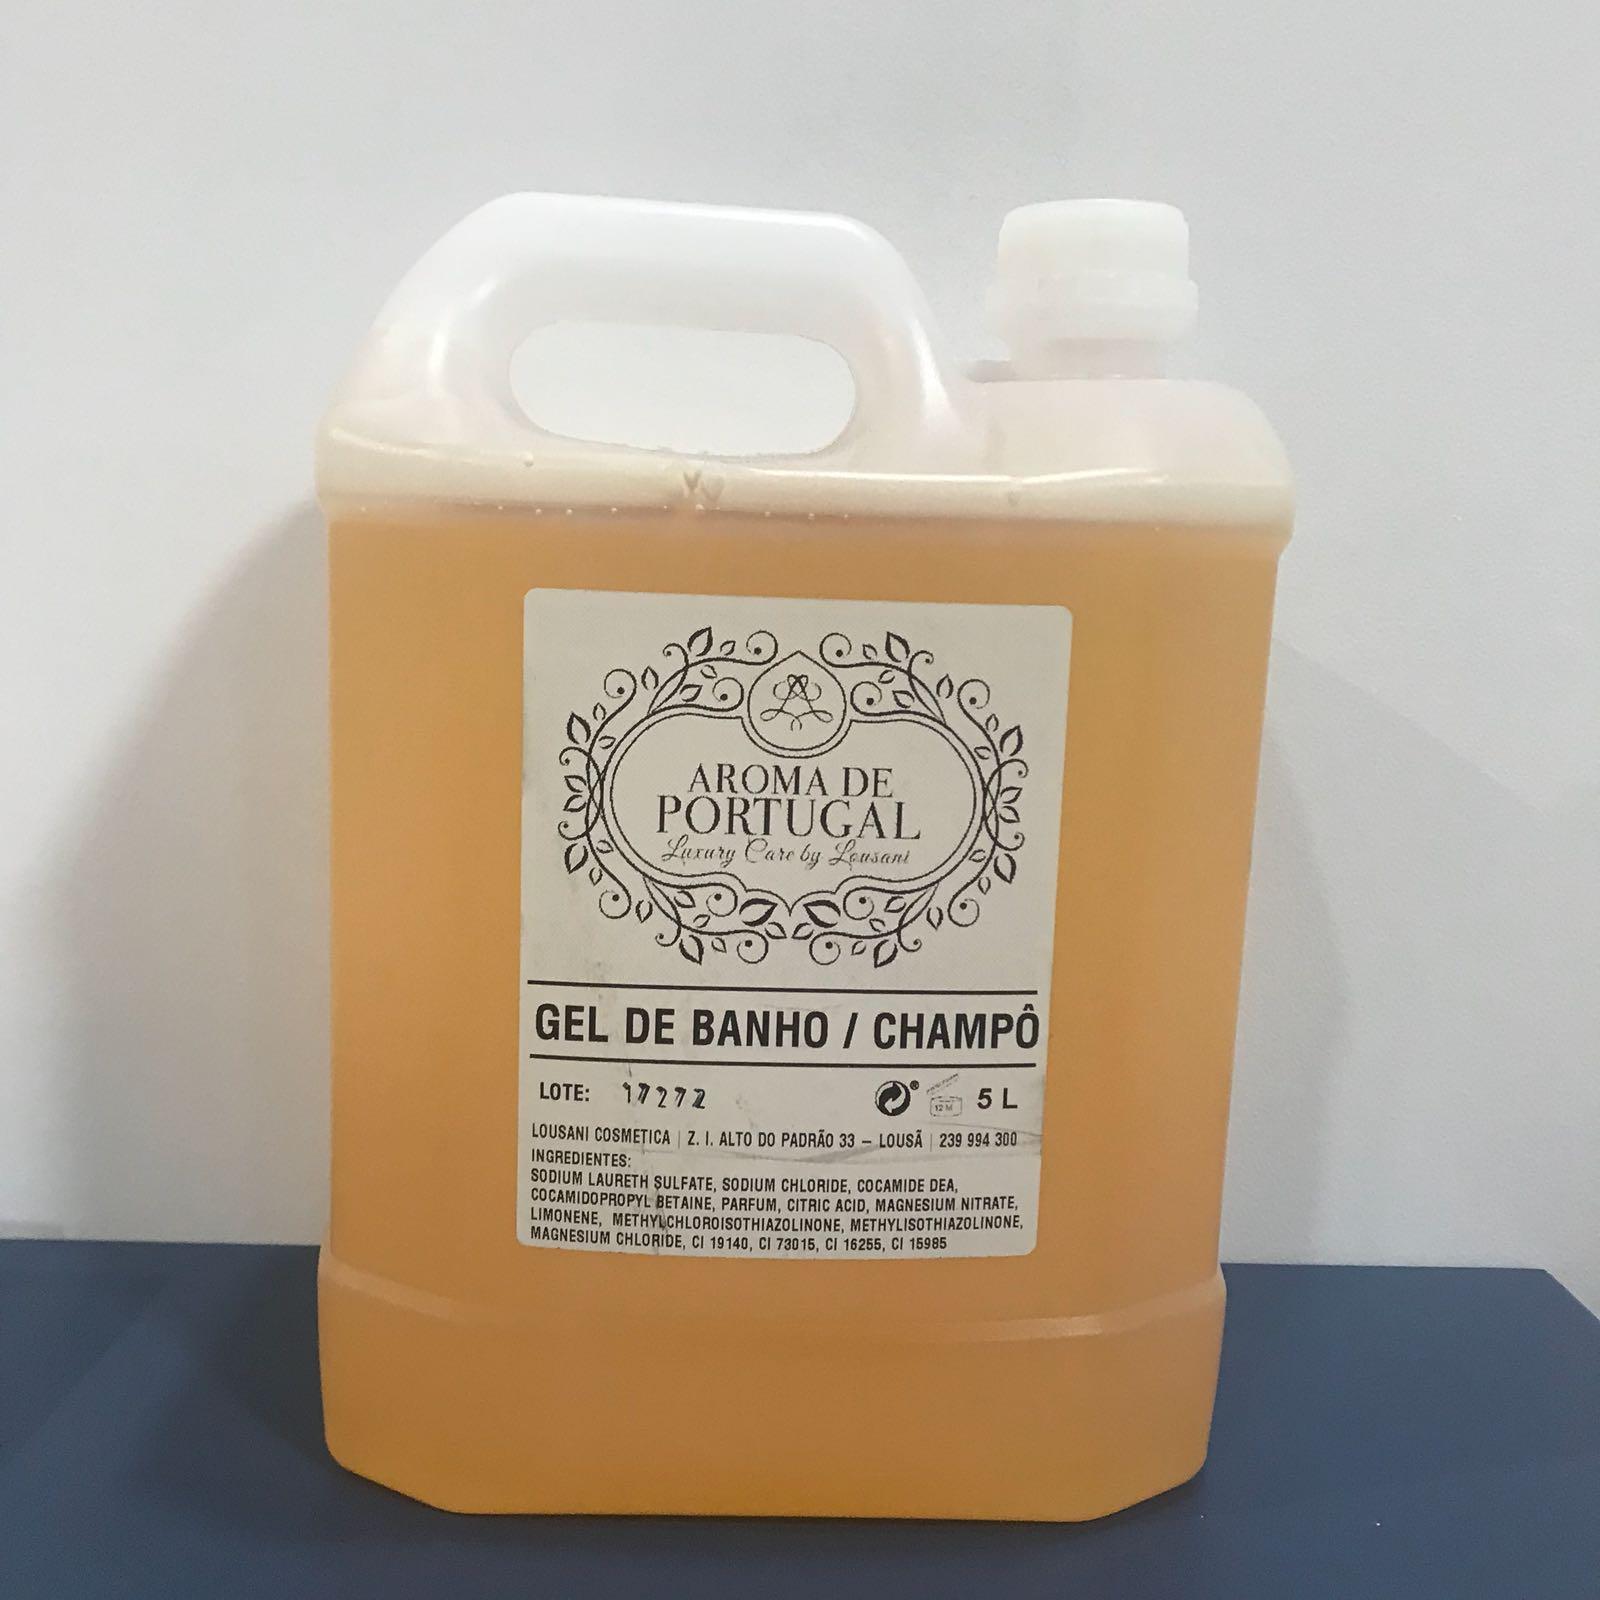 Recarga 5L champô/gel banho (1 uni) Aroma de Portugal